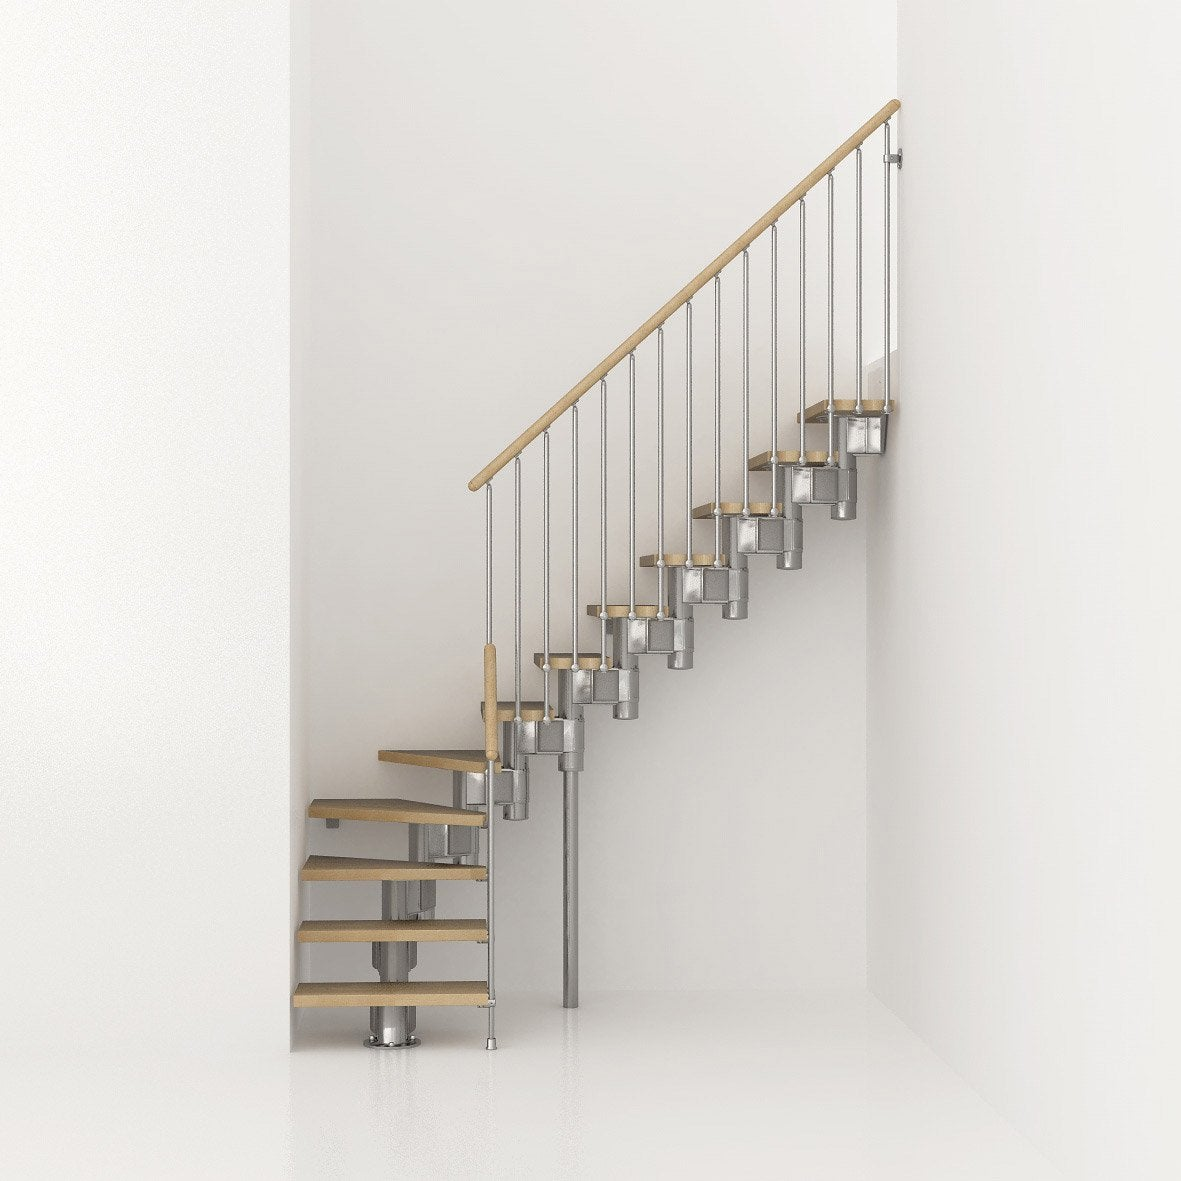 escalier modulaire long structure m tal marche bois leroy merlin. Black Bedroom Furniture Sets. Home Design Ideas